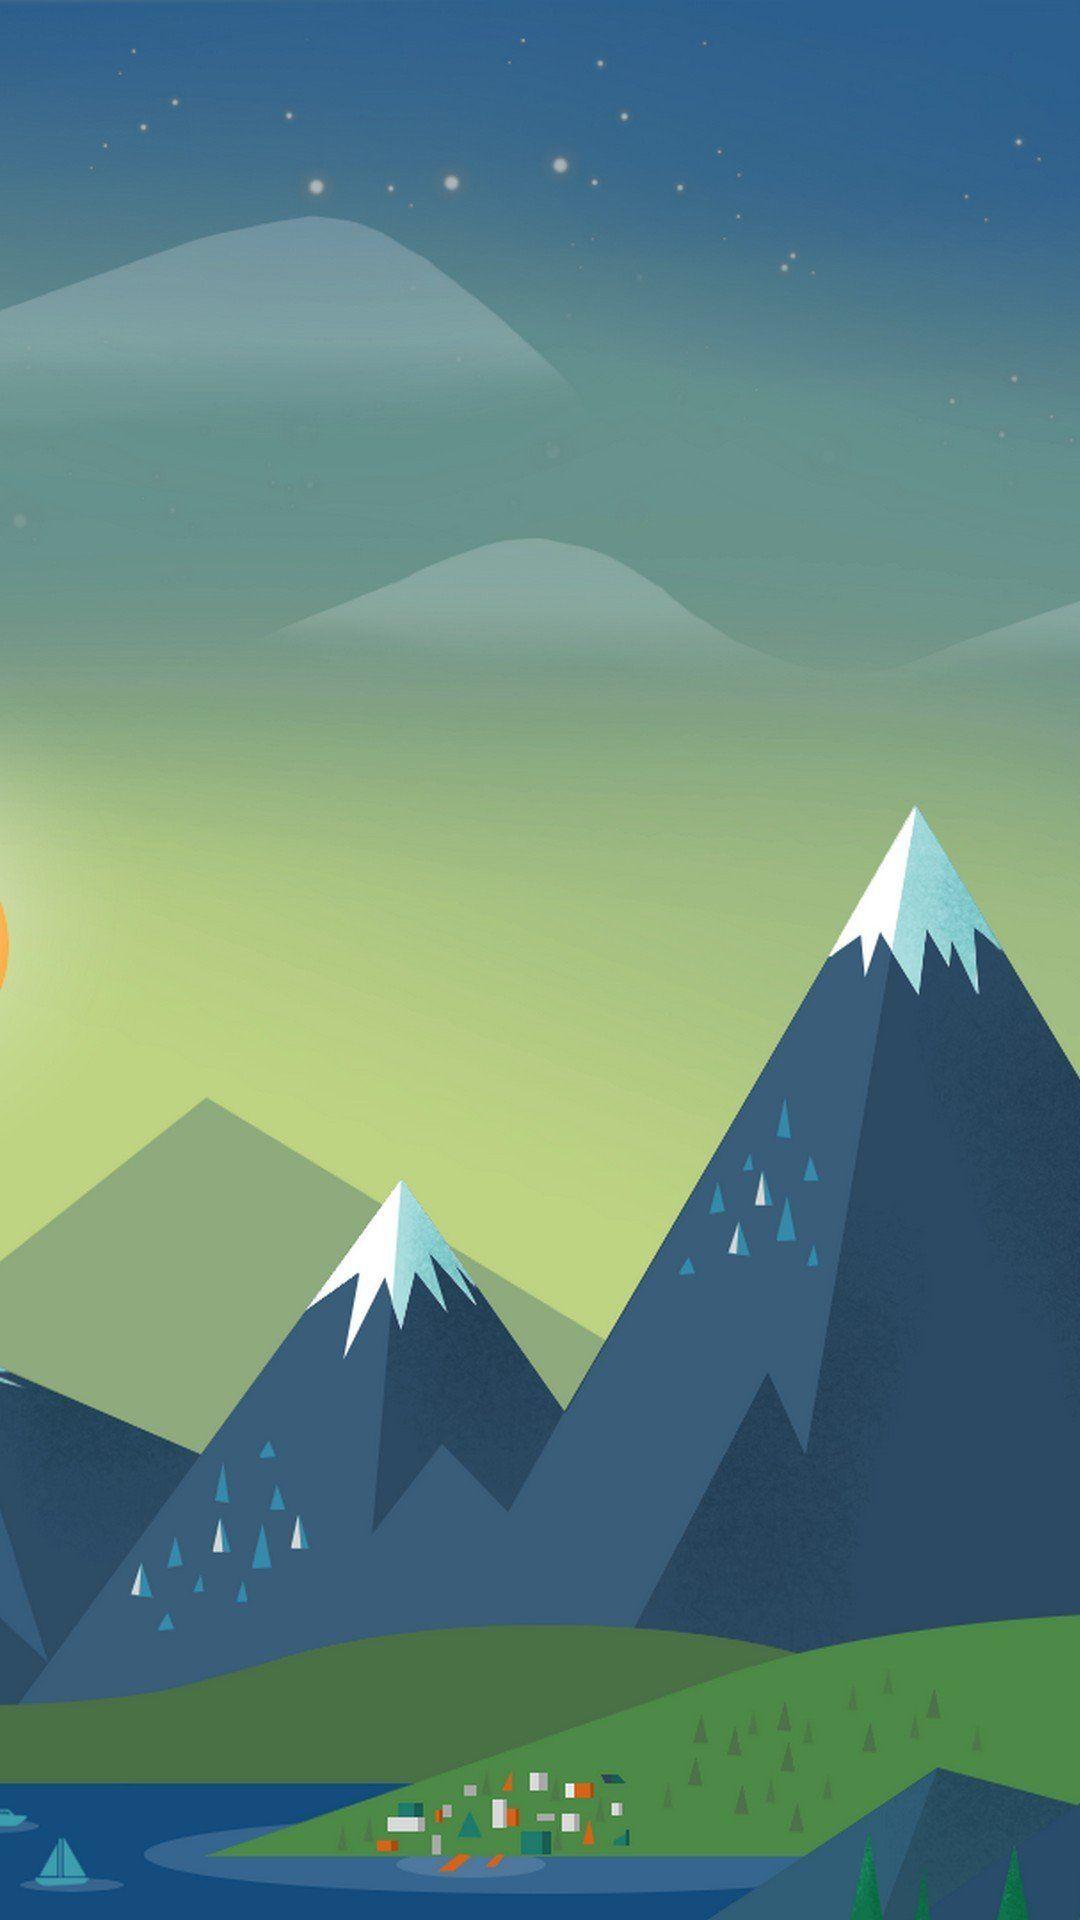 Evening Mountain Ice Mobile Wallpaper Mobile Wallpaper